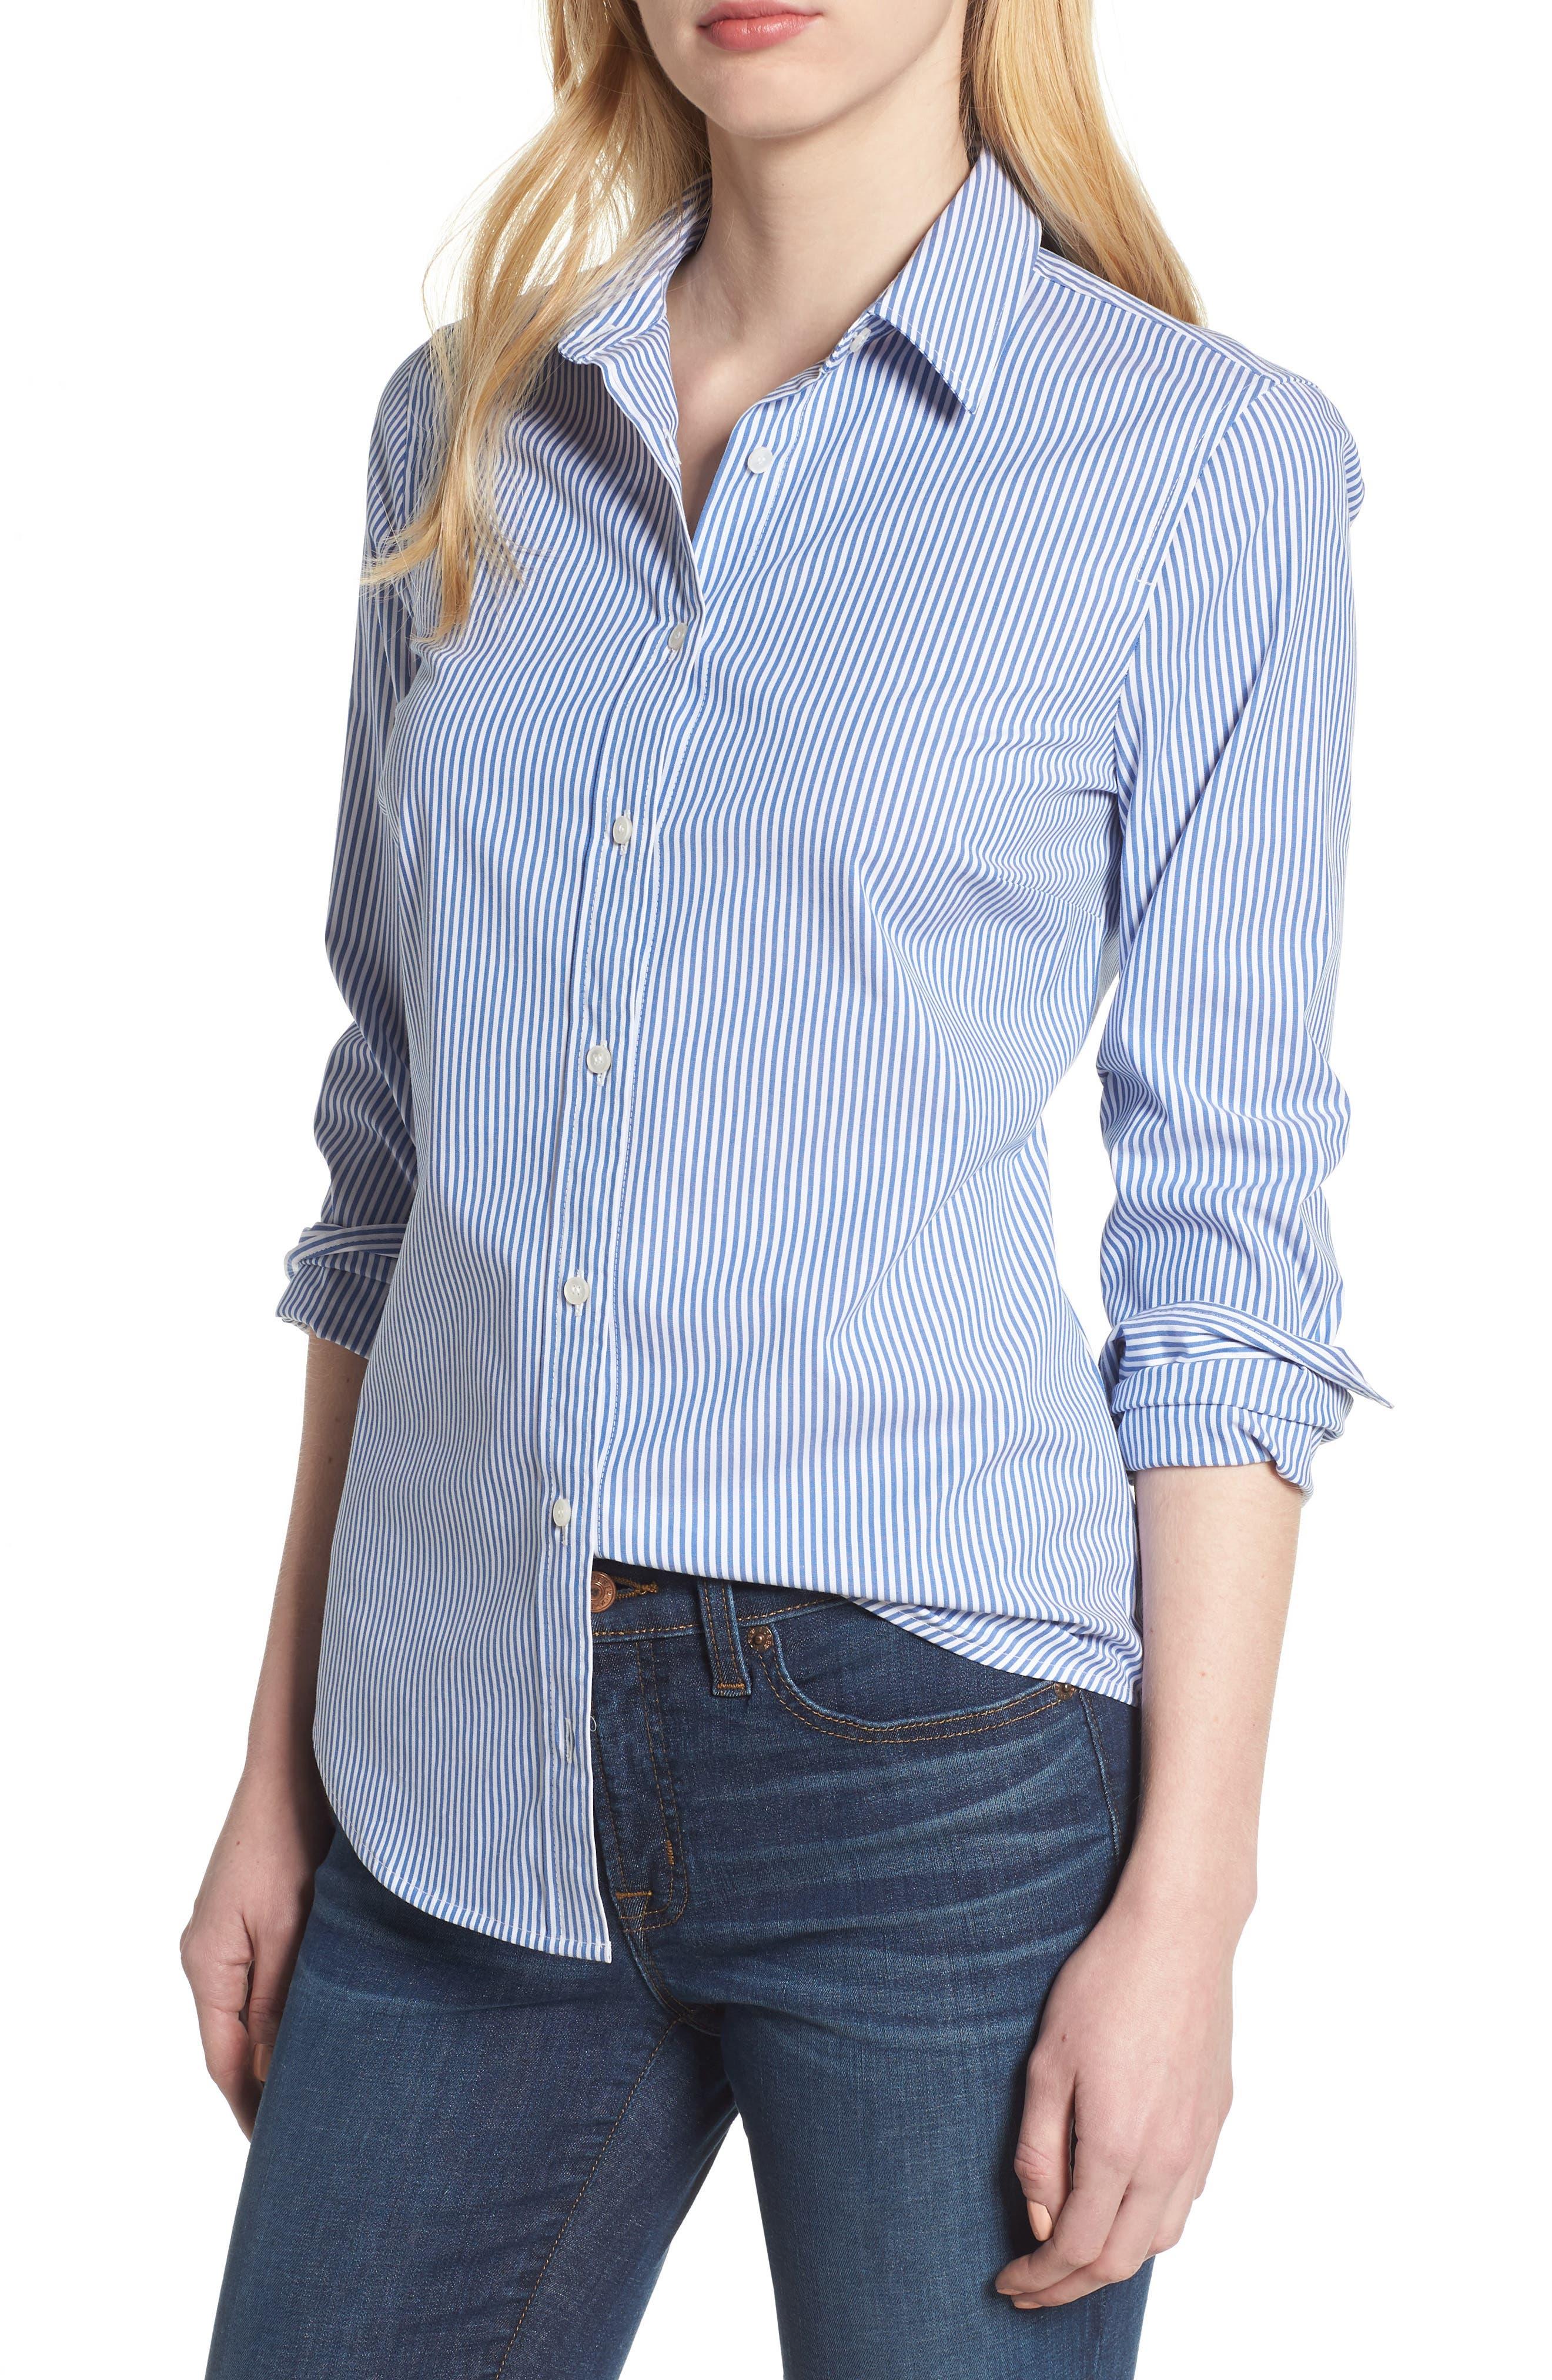 Main Image - J.Crew Perfect Classic Stripe Stretch Cotton Shirt (Regular & Petite)